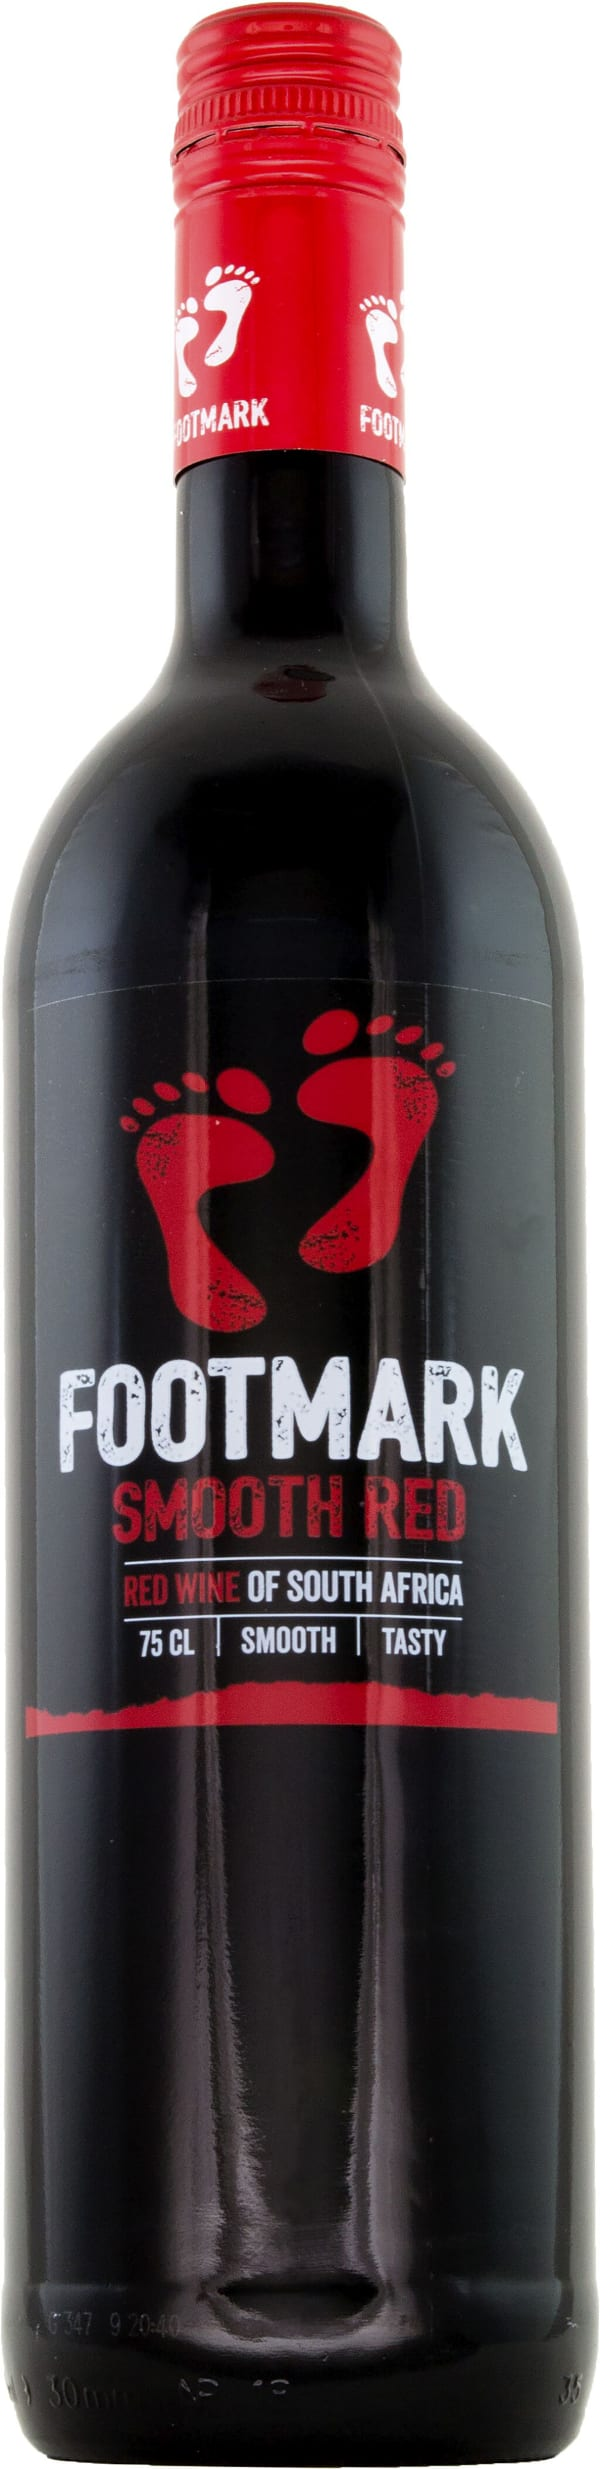 Footmark Smooth Red 2019